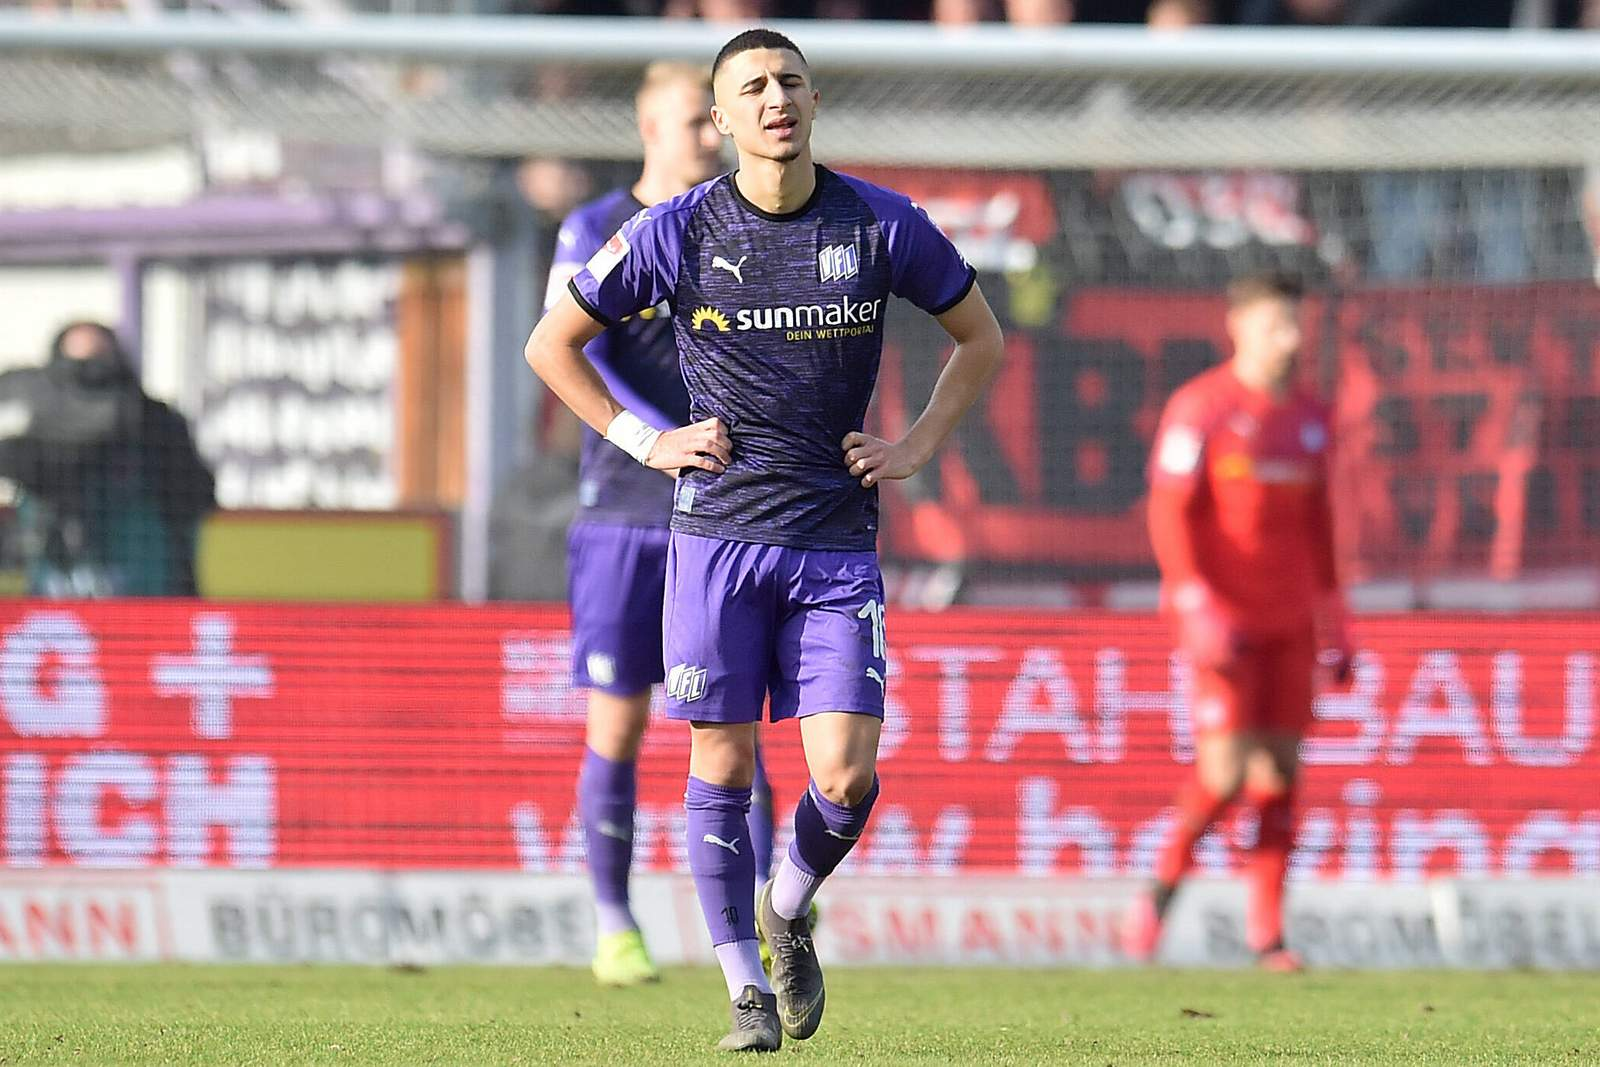 Anas Ouahim vom VfL Osnabrück ist enttäuscht